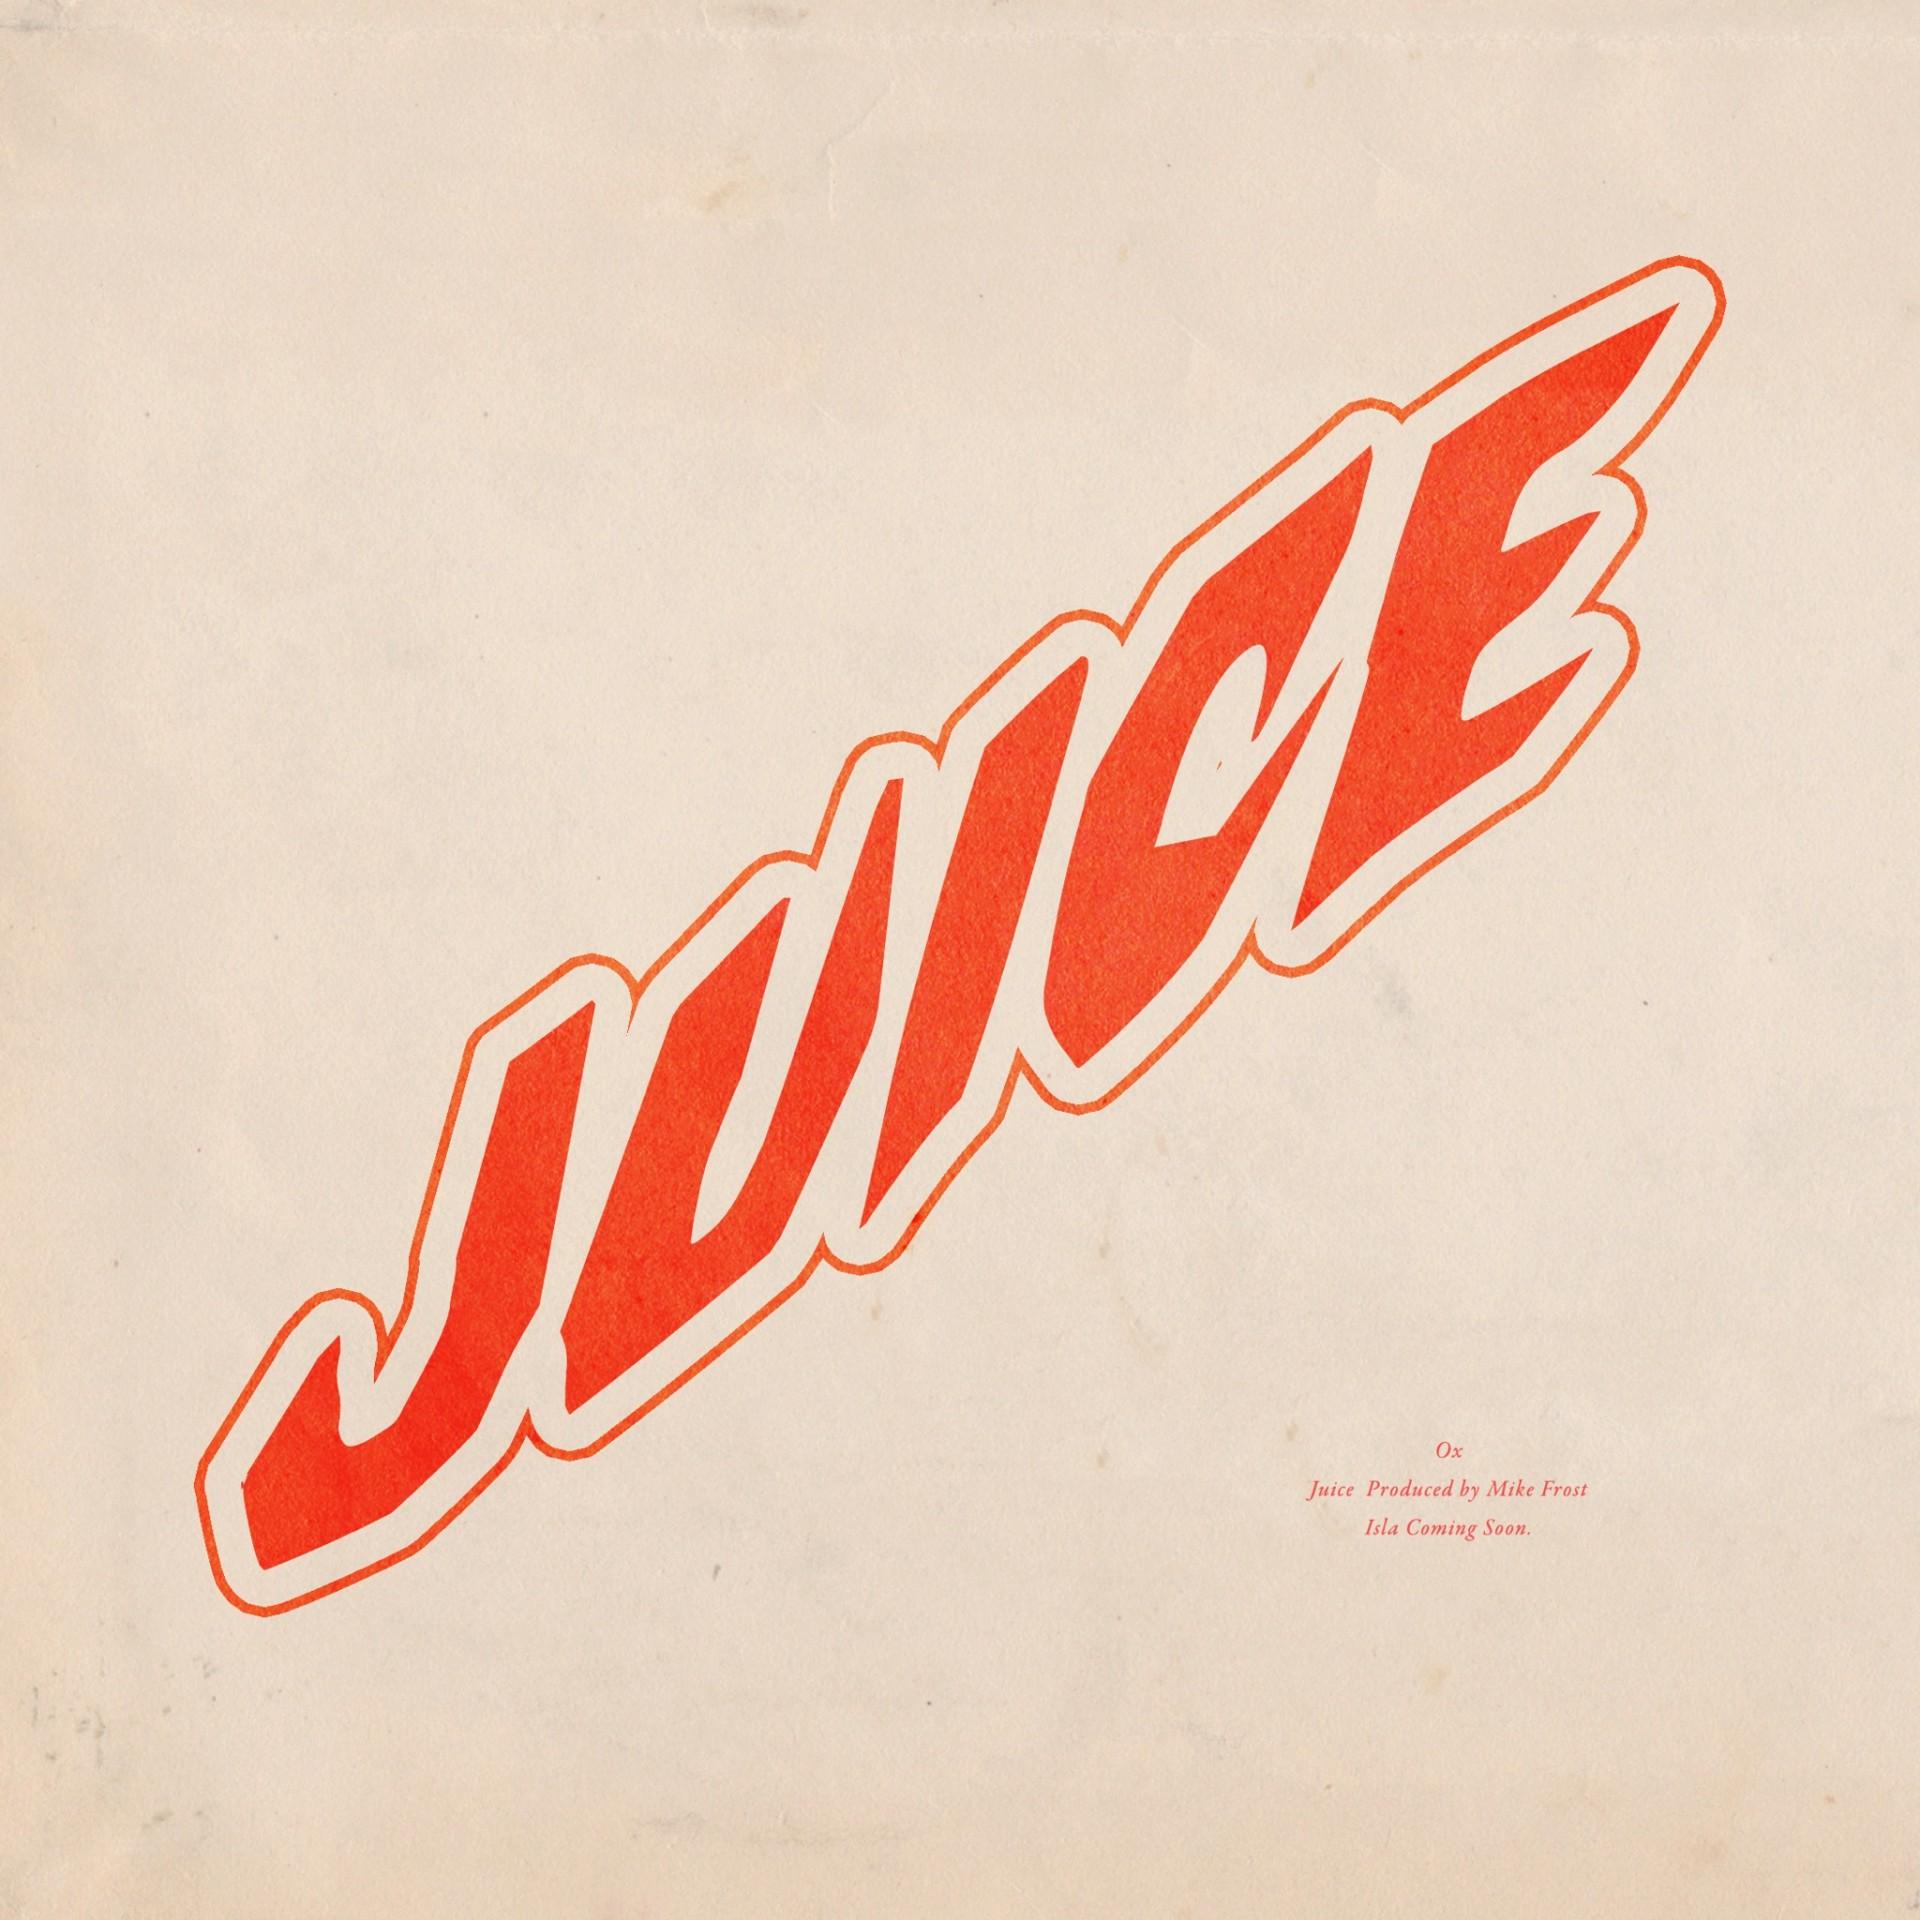 Work Juice